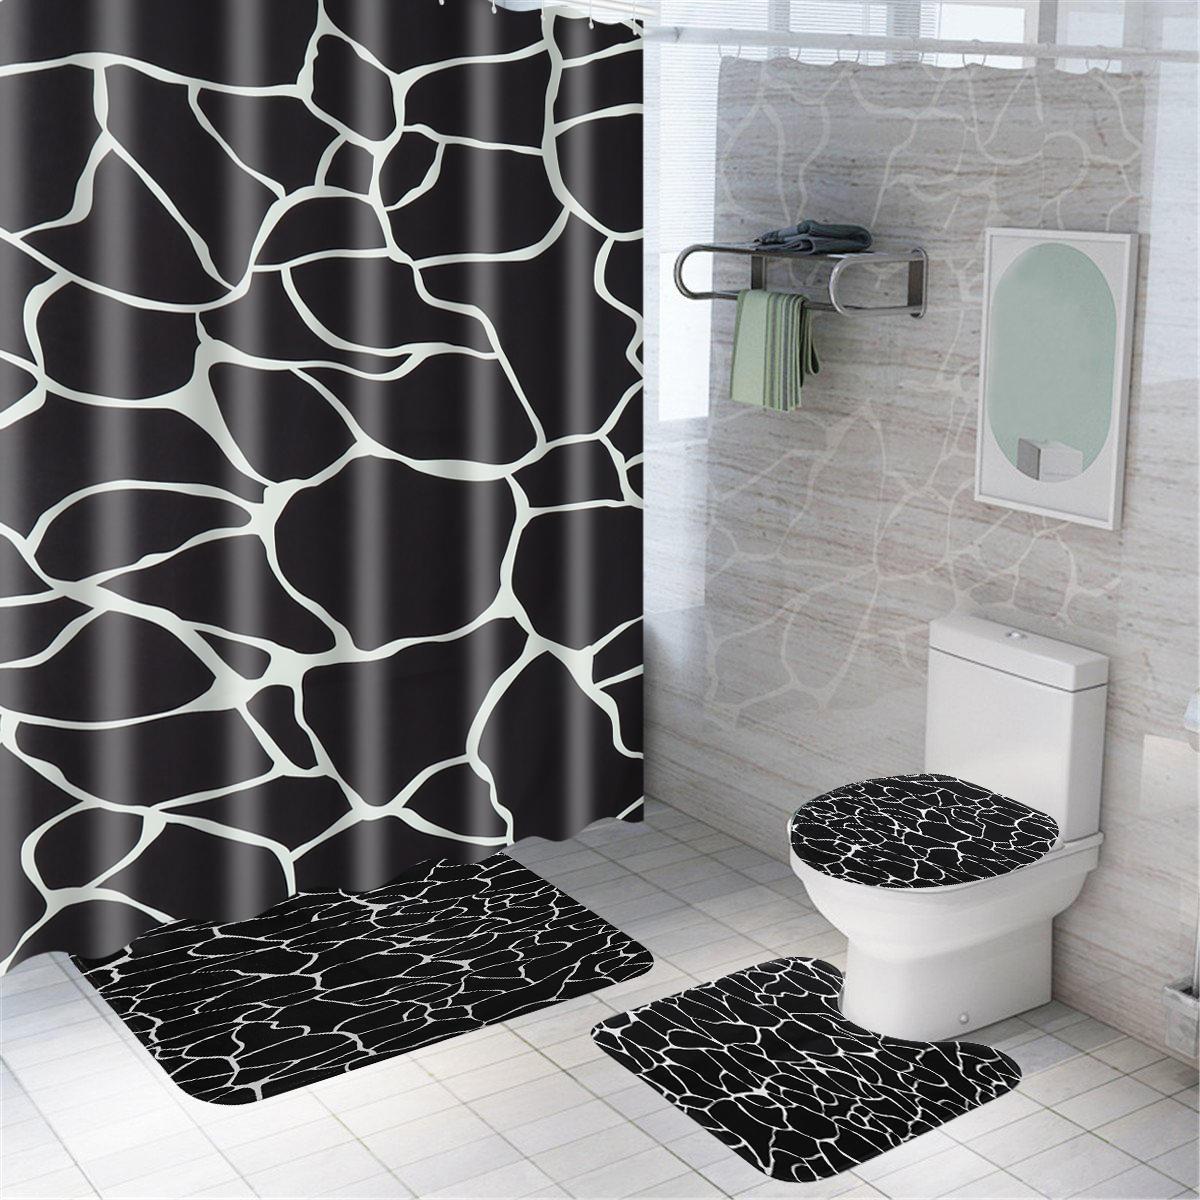 Marble Shower Curtain Waterproof Bathroom Bath Mat Set Rug Toilet Lid Covers A Shower Curtain Sale Banggood Com